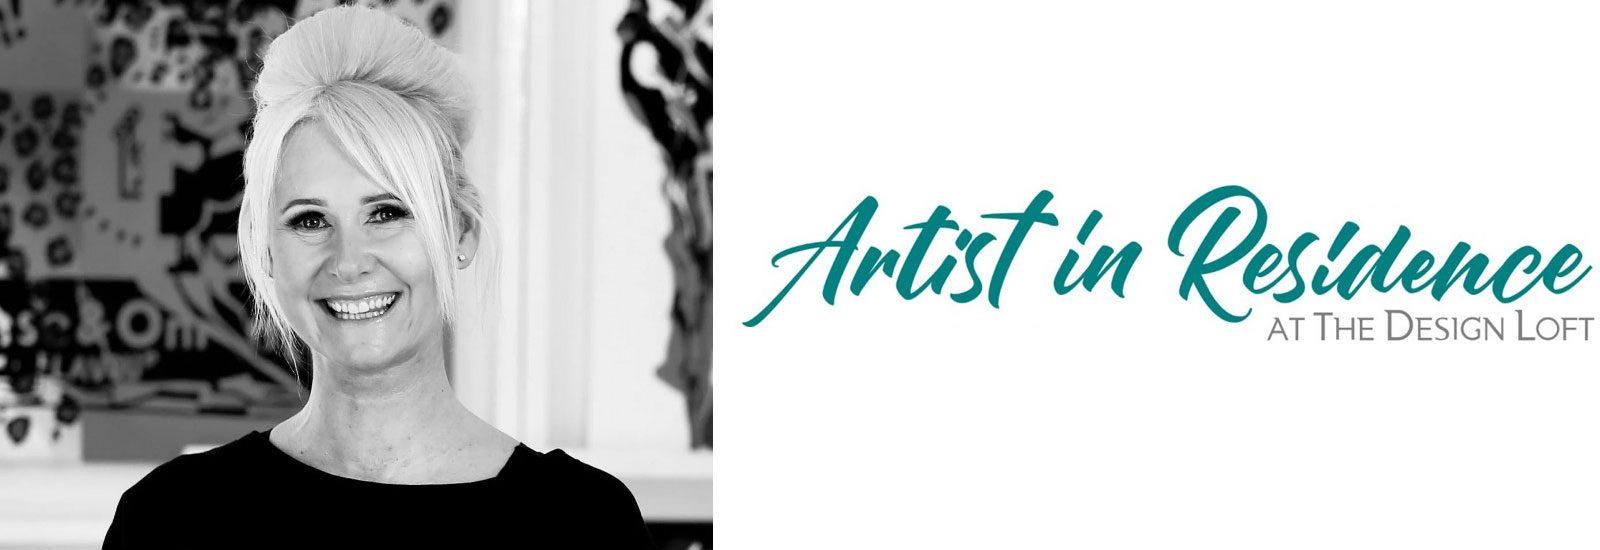 Orla Walsh Artist in Residence at The Design Loft